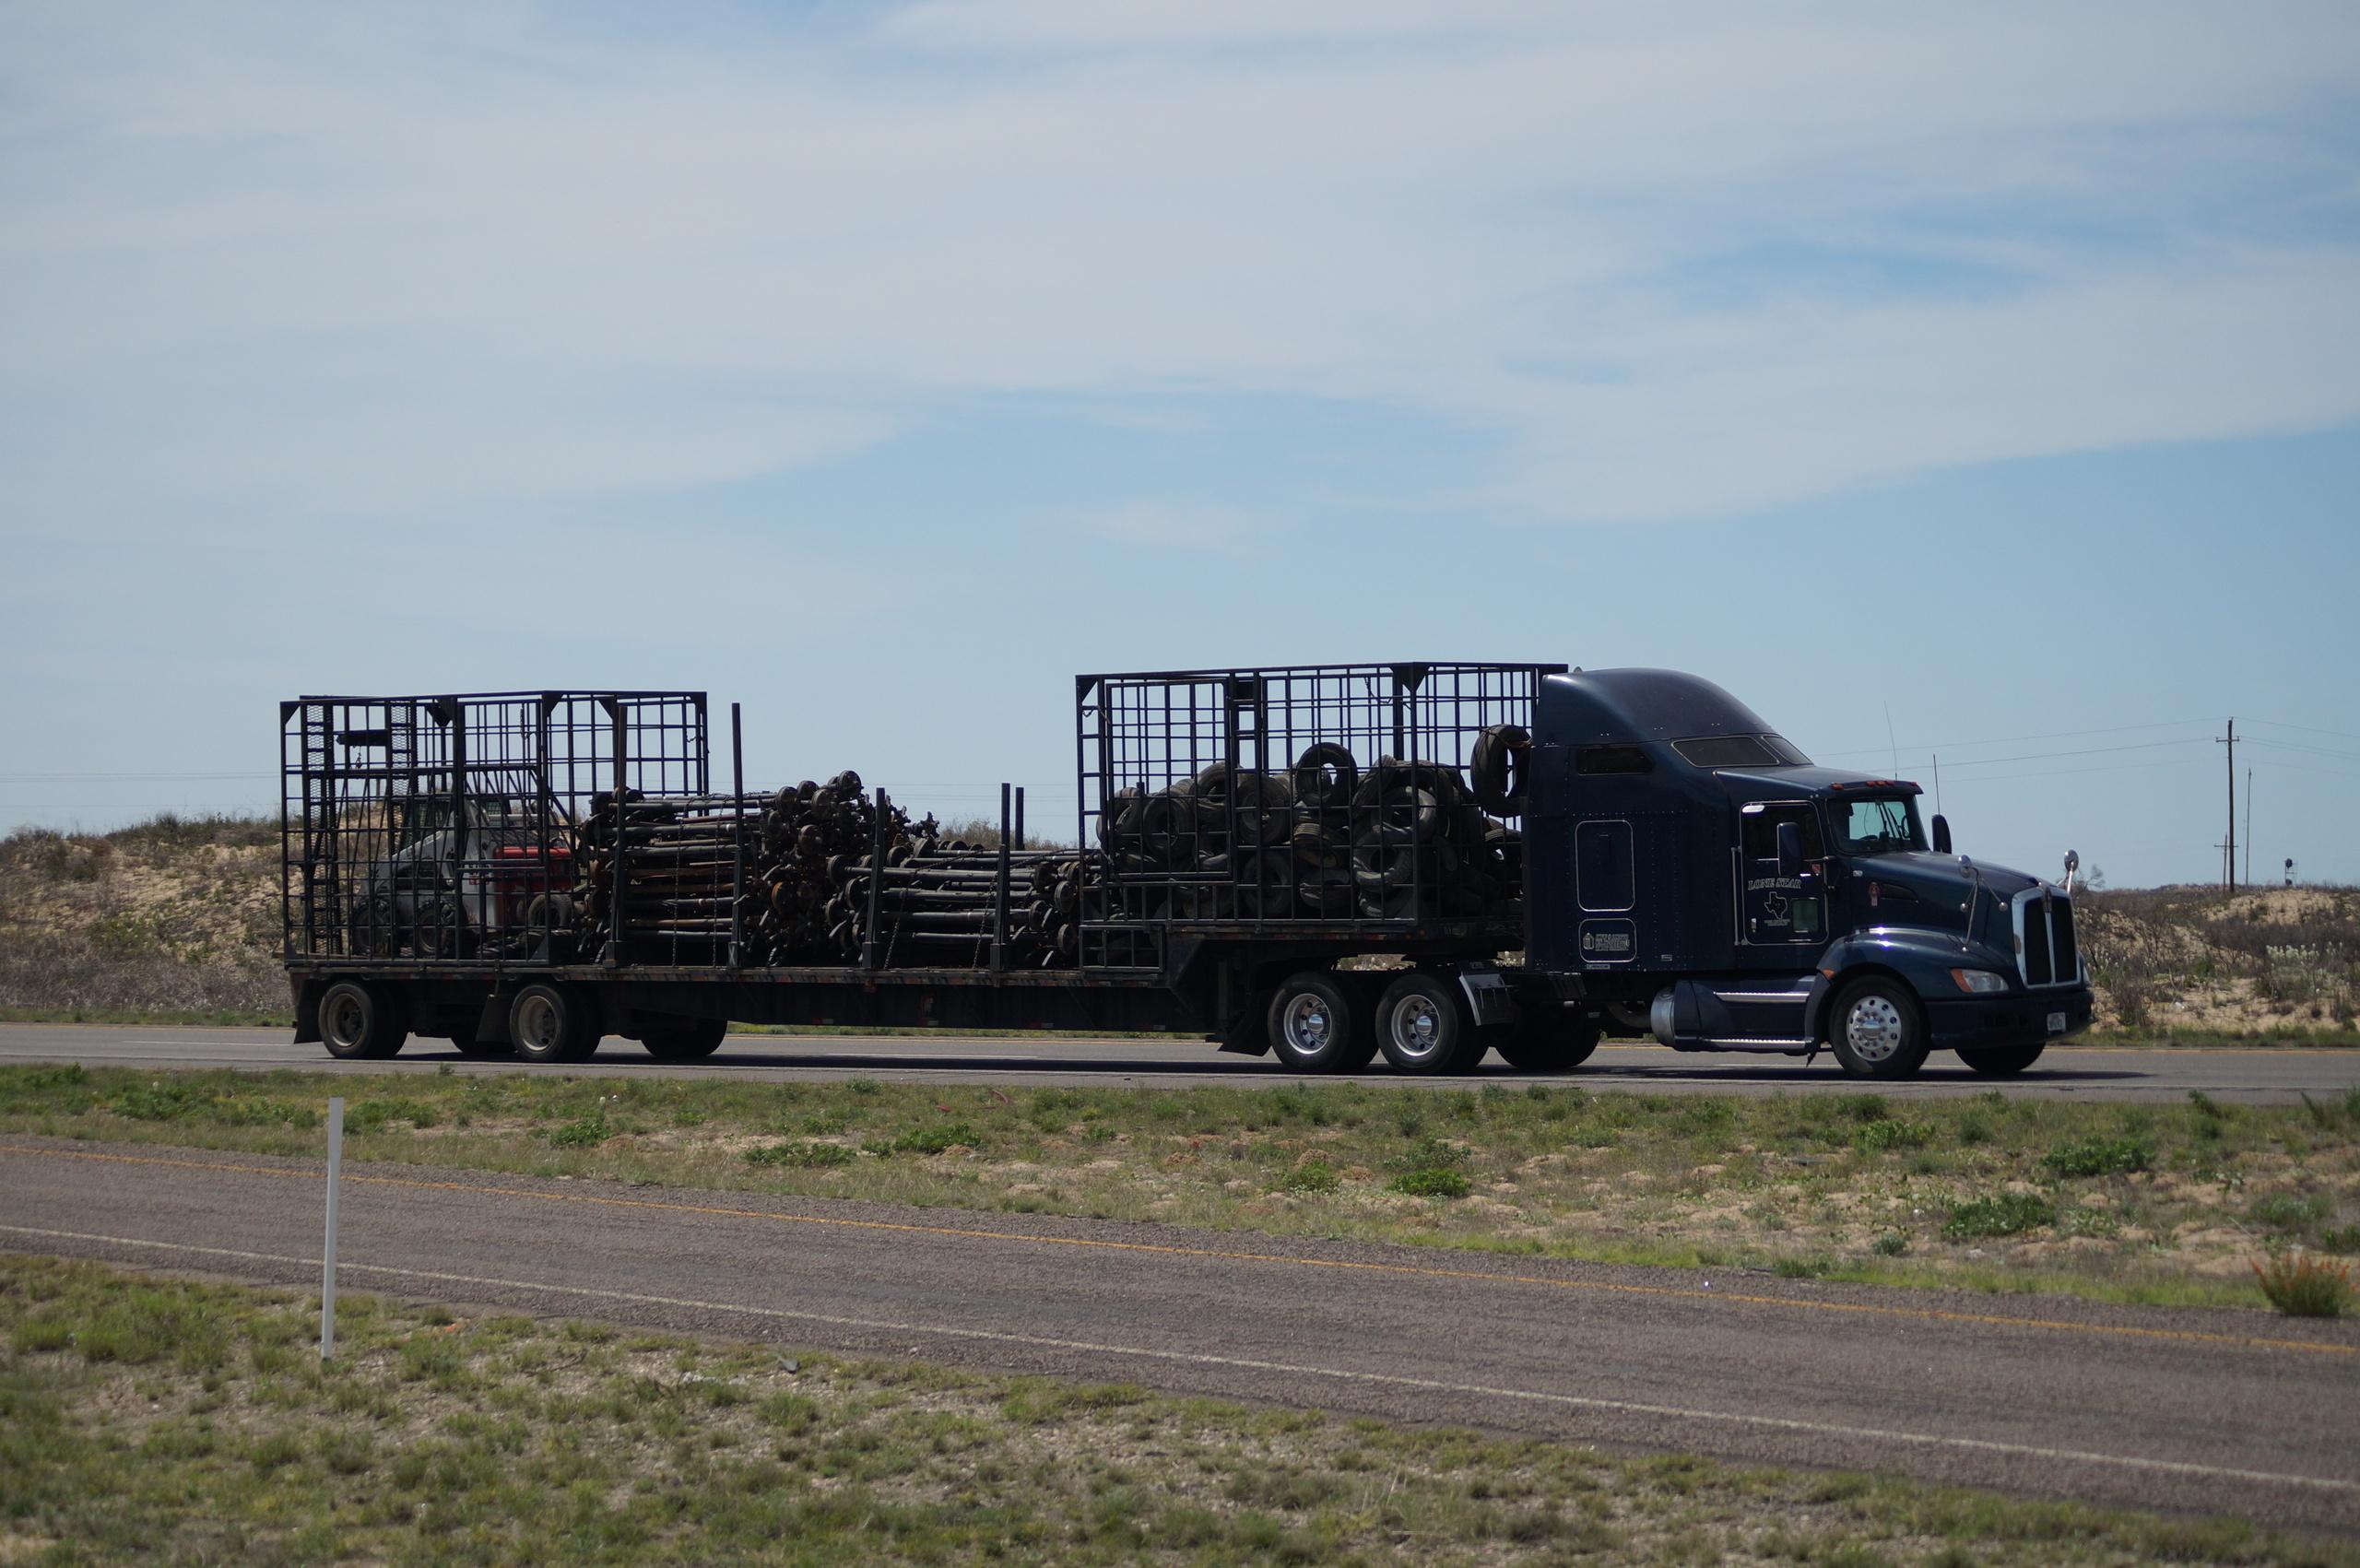 Coil Tubing Operator Odessa Tx: 4/2/15 @ Monahans, TX